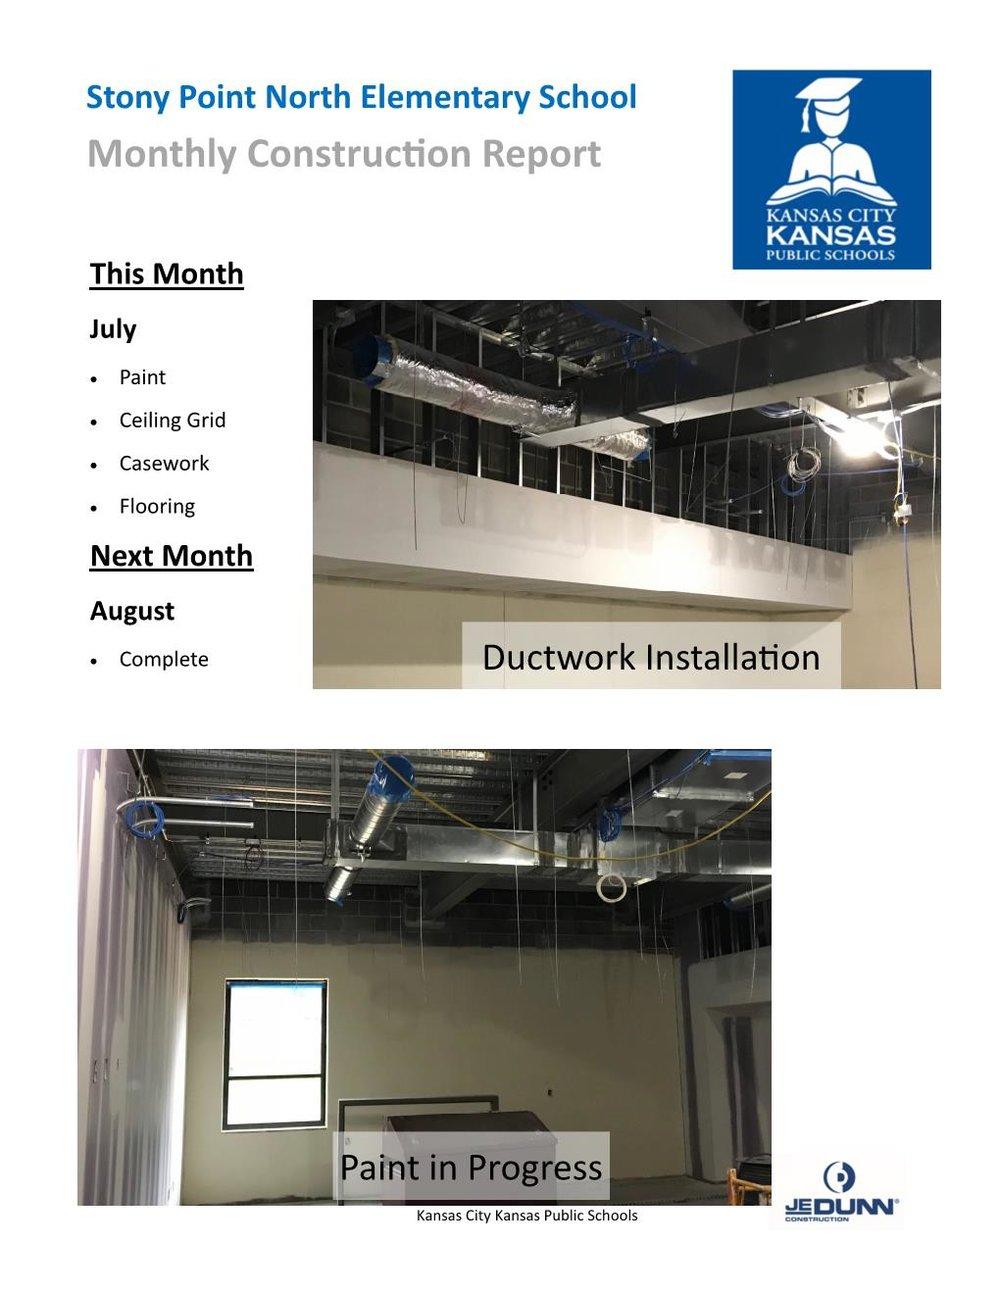 2018.07.16 - WP 04 July Photo Report SPN.jpg